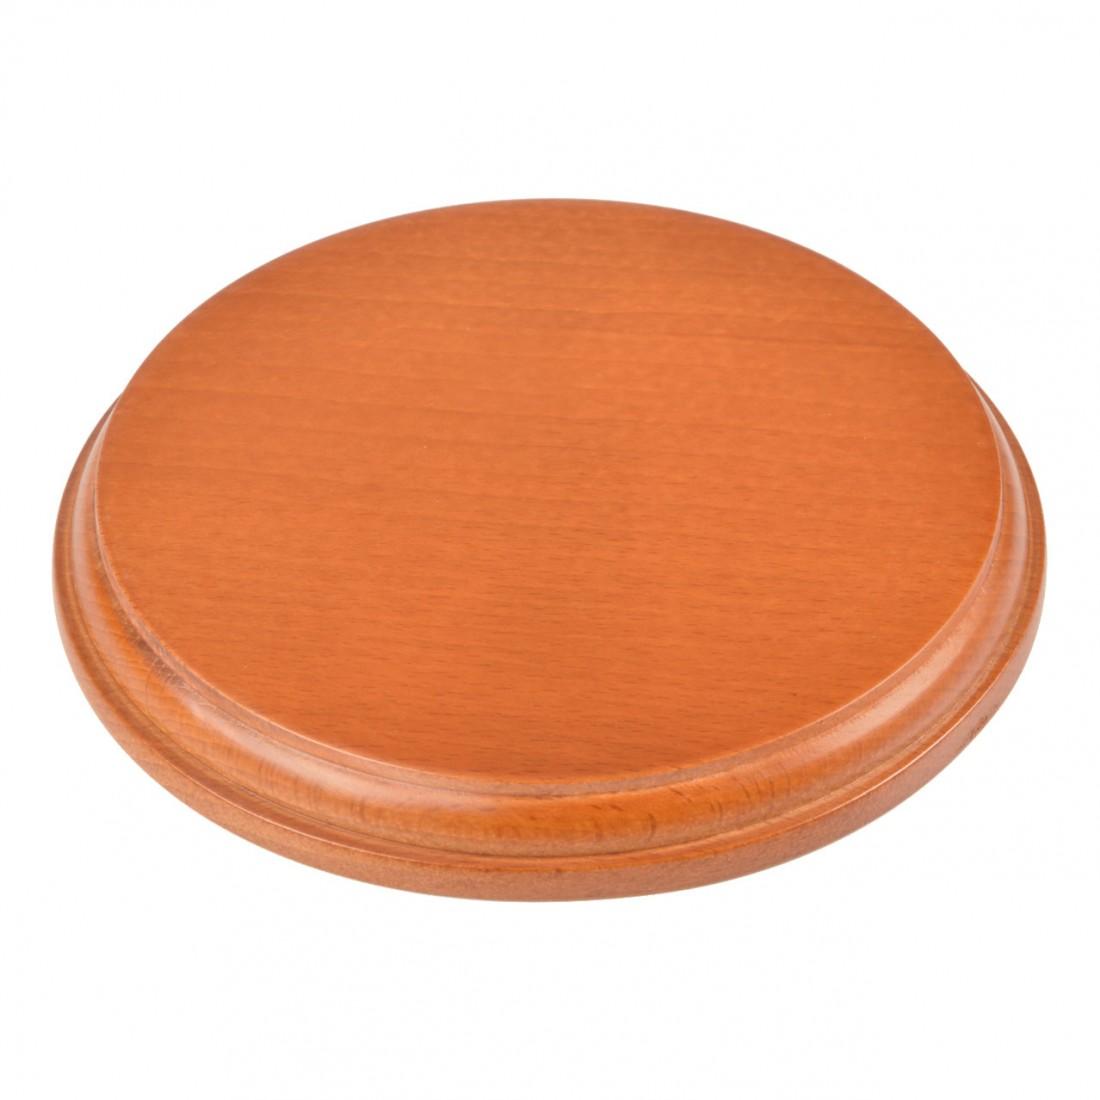 Base redonda de madera mm.160 barnizada.